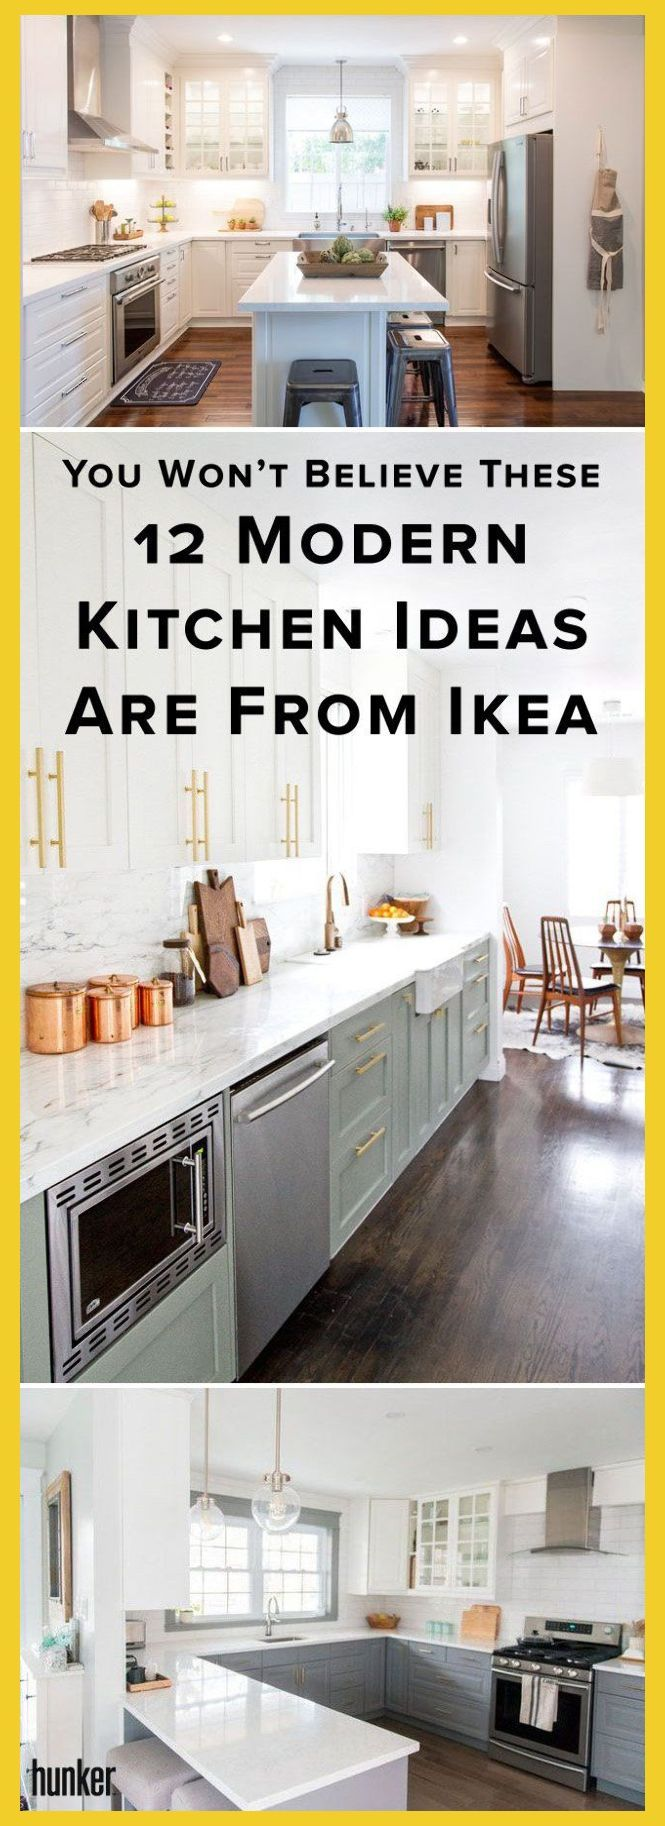 Cheap Kitchen Remodel Ideas Small Kitchen Designs On A Budget Home Decor Ideas Cheap Kitchen Remodel Kitchen Design Diy Kitchen Design Small